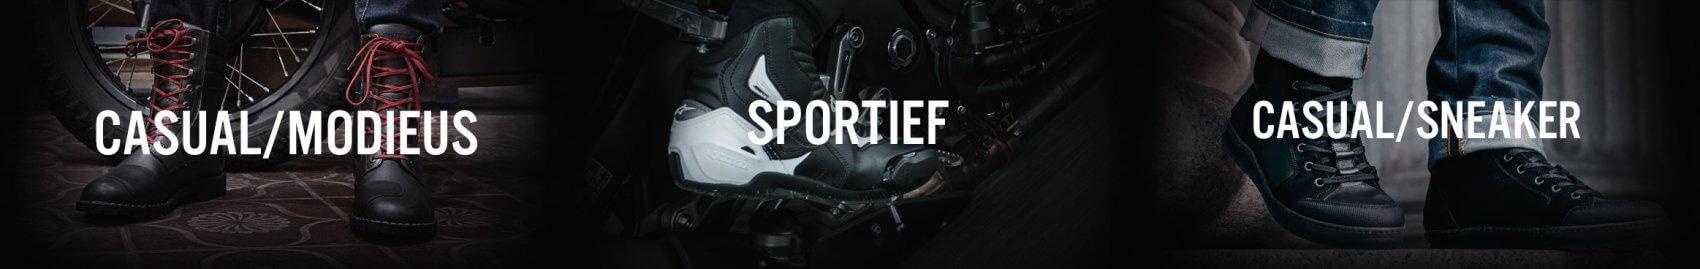 casual sportieve en modieuze motorschoenen